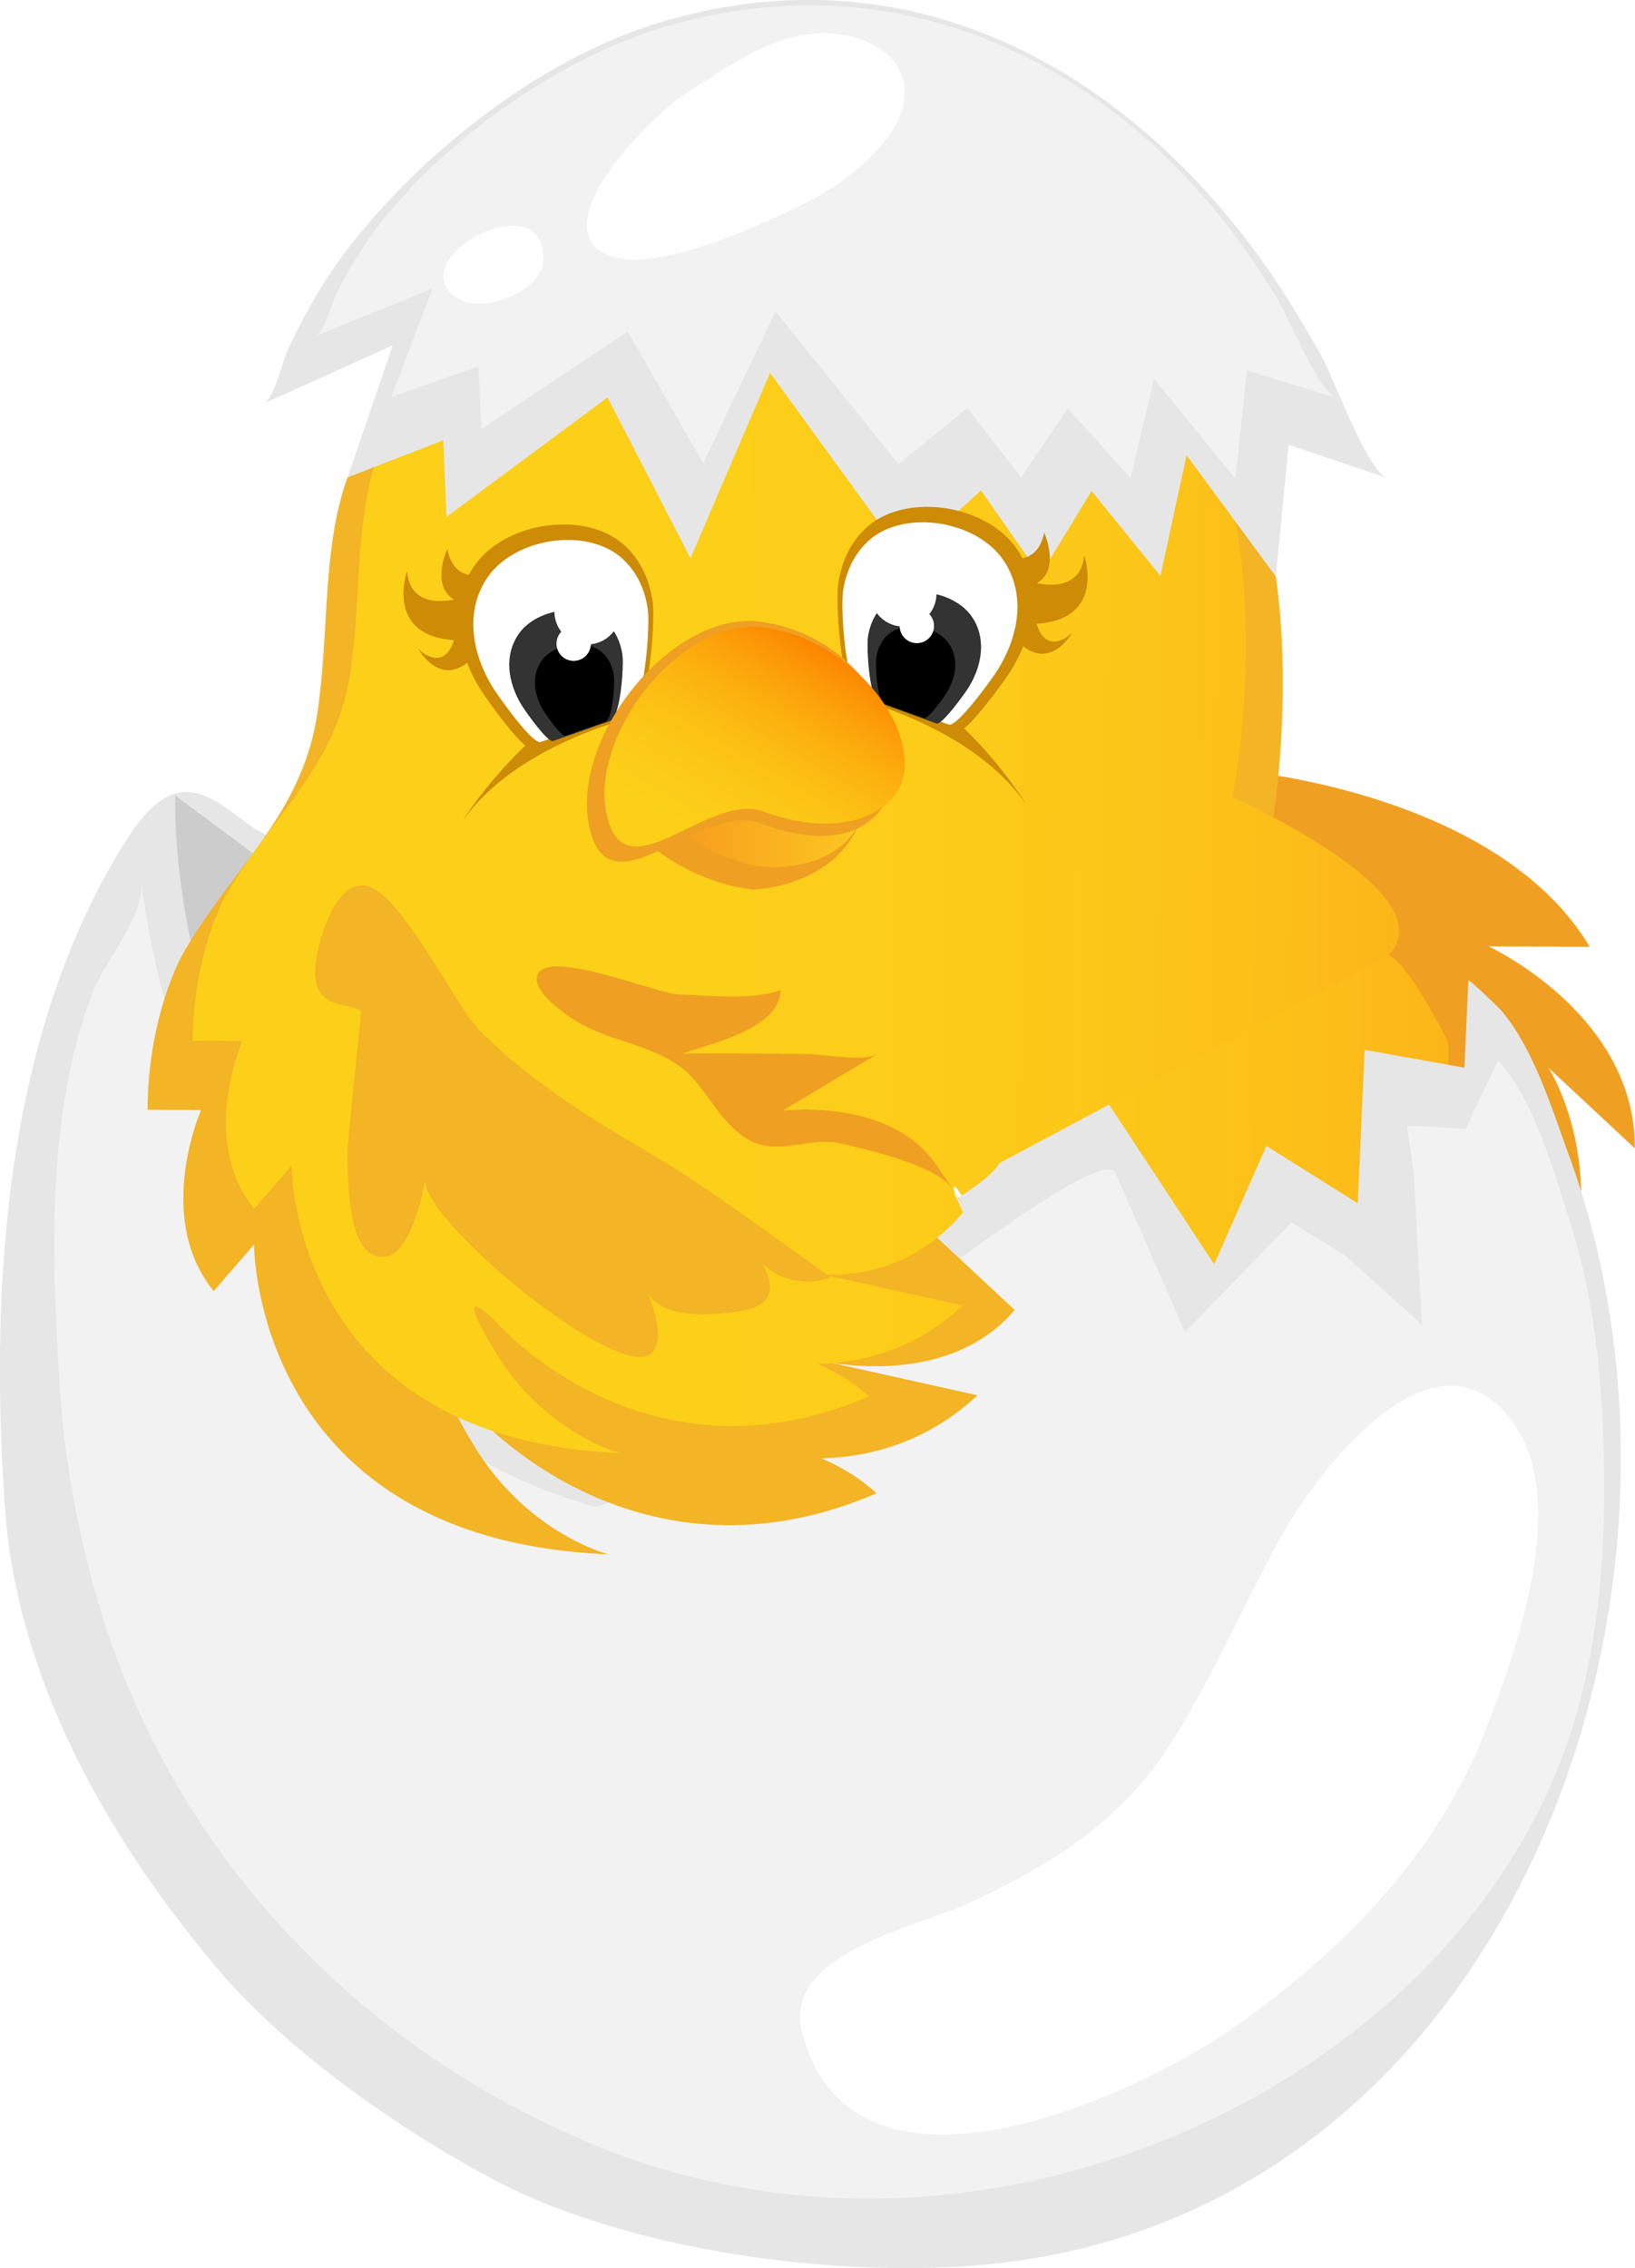 цыпленок клипарт: